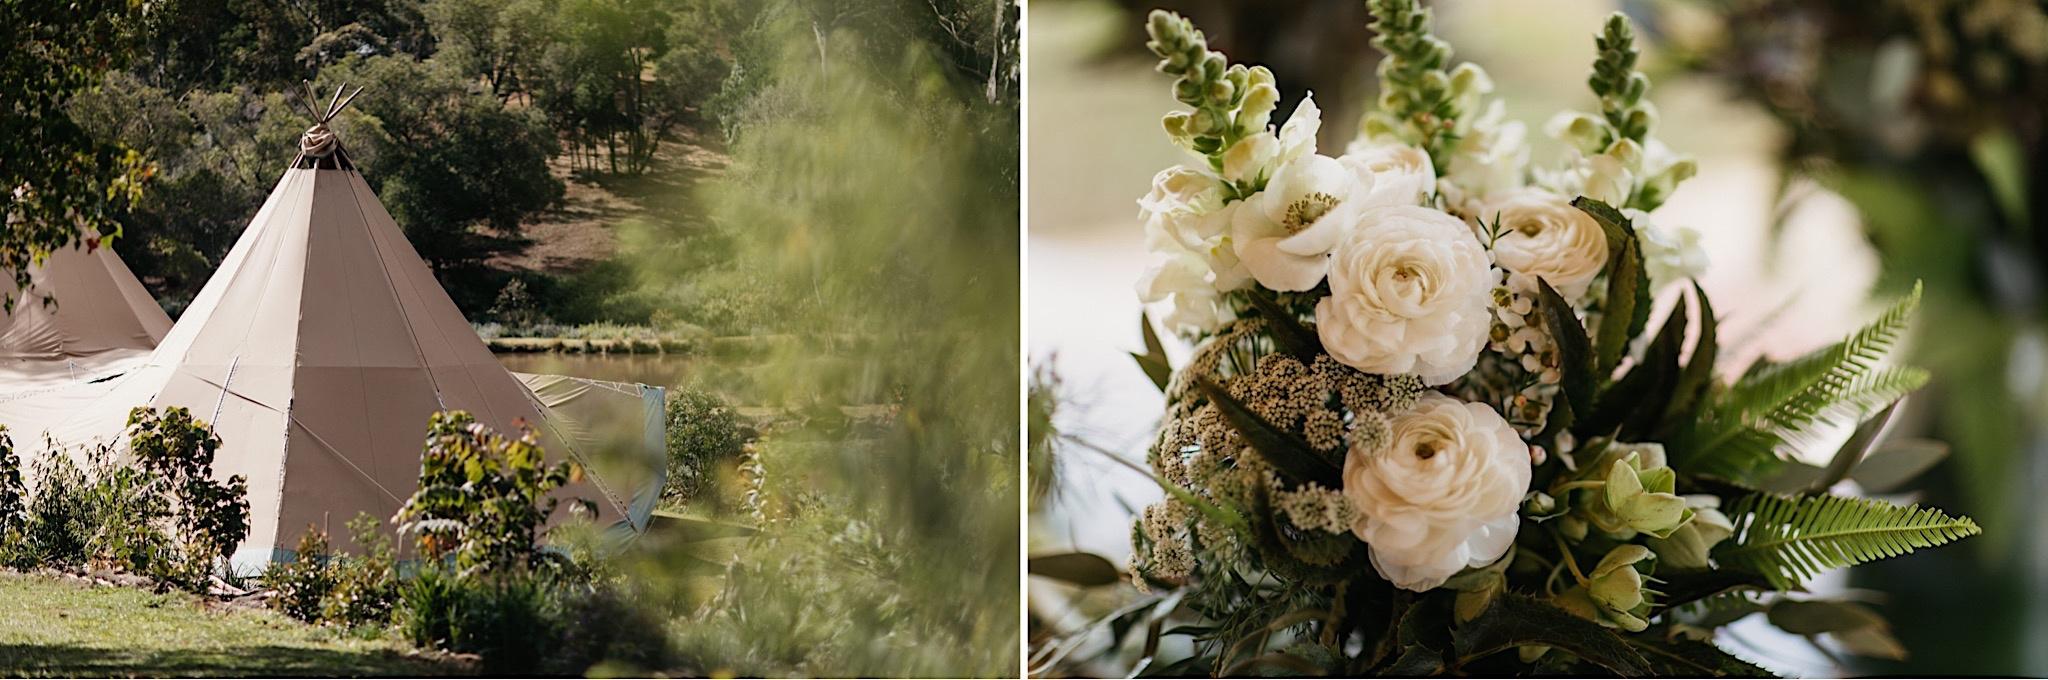 018_SBA-Jen-Tom-Wedding-47_SBA-Jen-Tom-Wedding-49.jpg